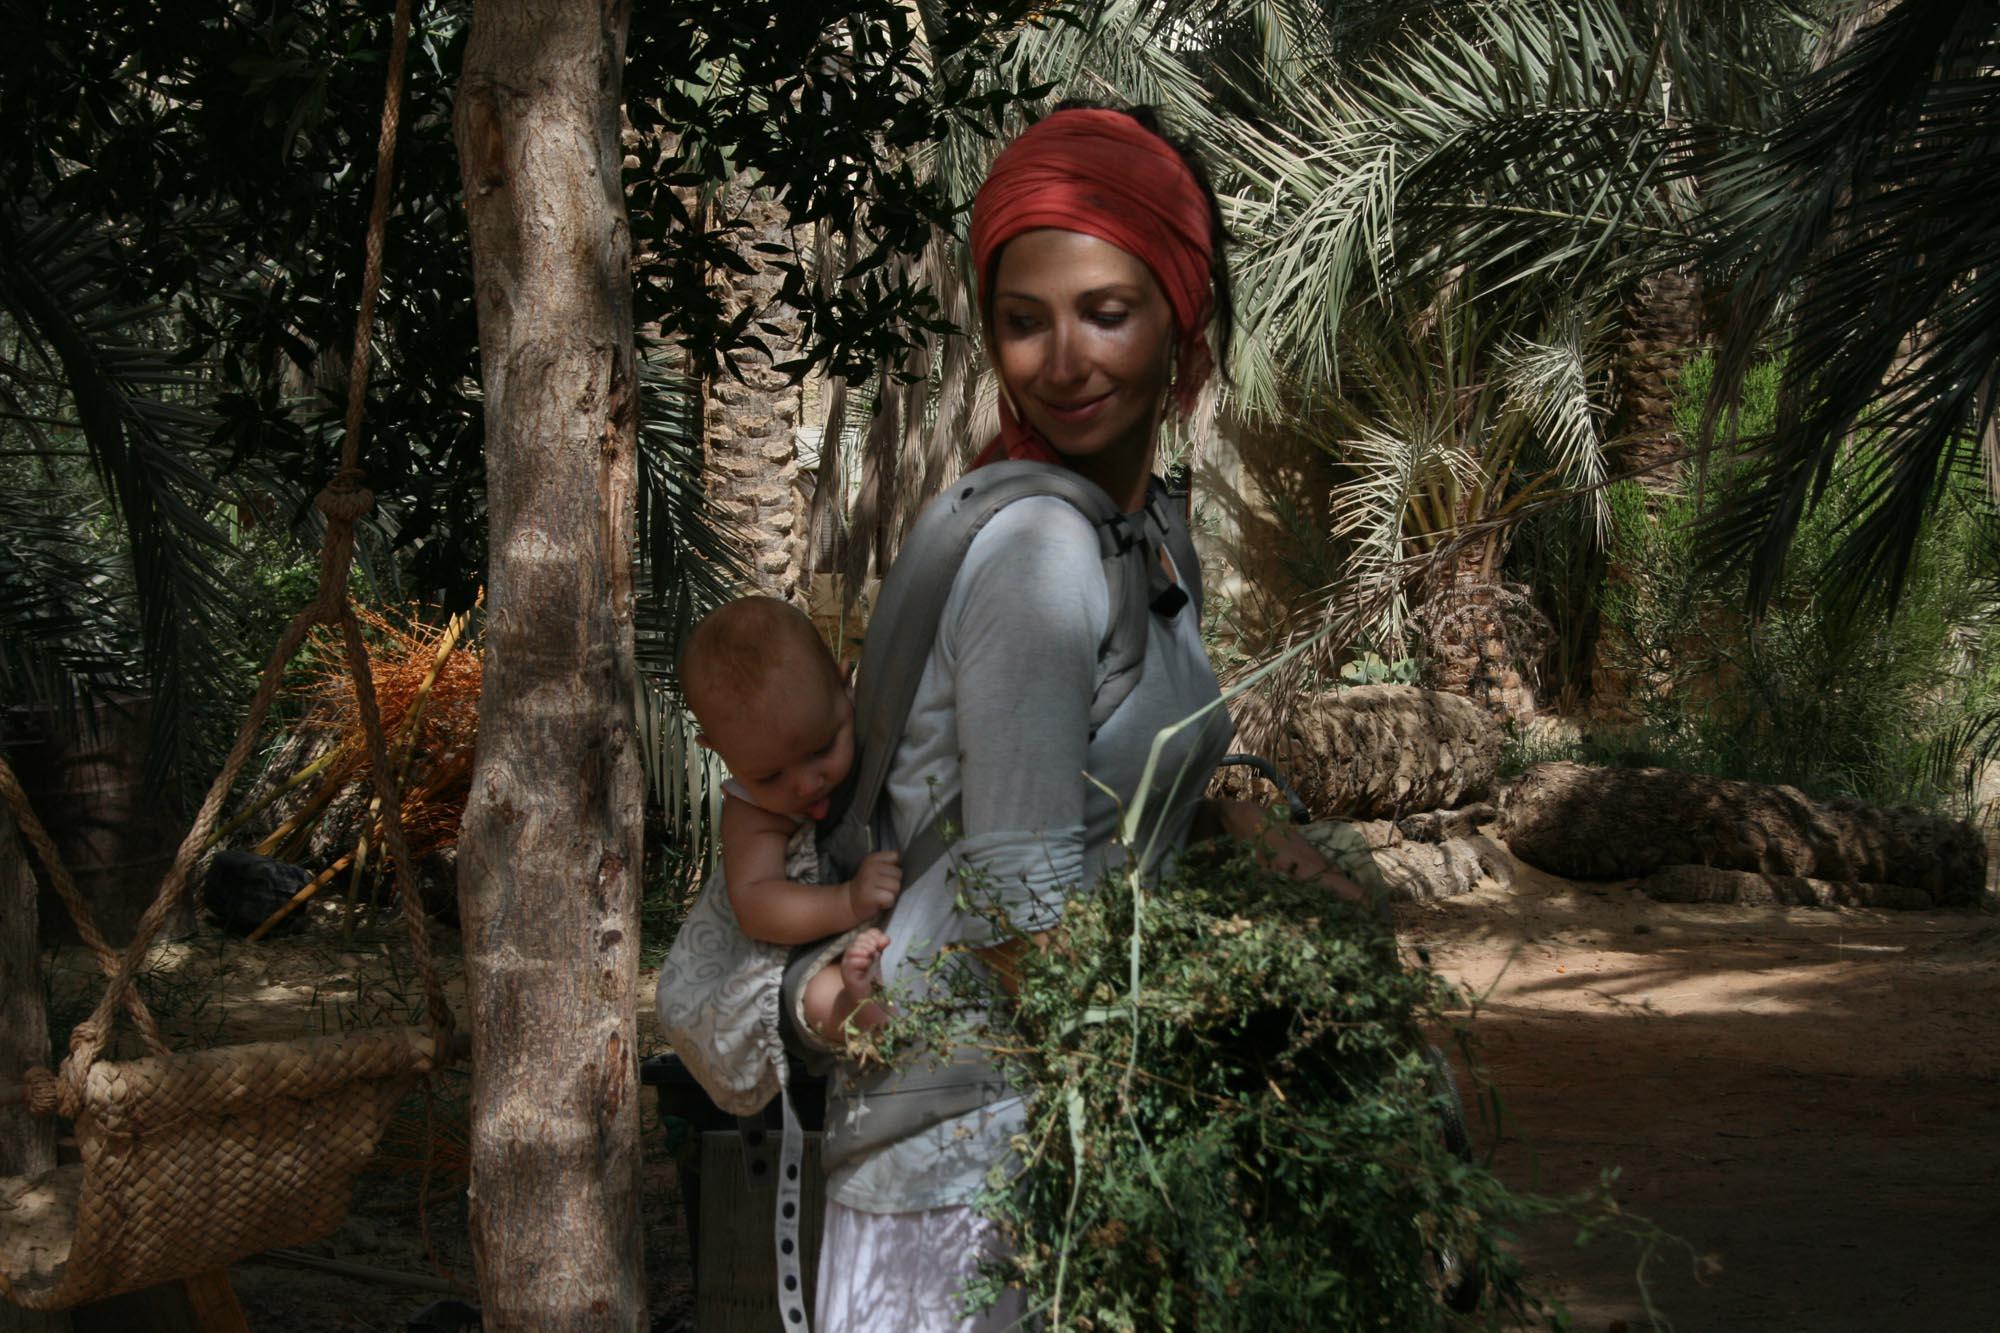 Child-wearing in the desert garden.